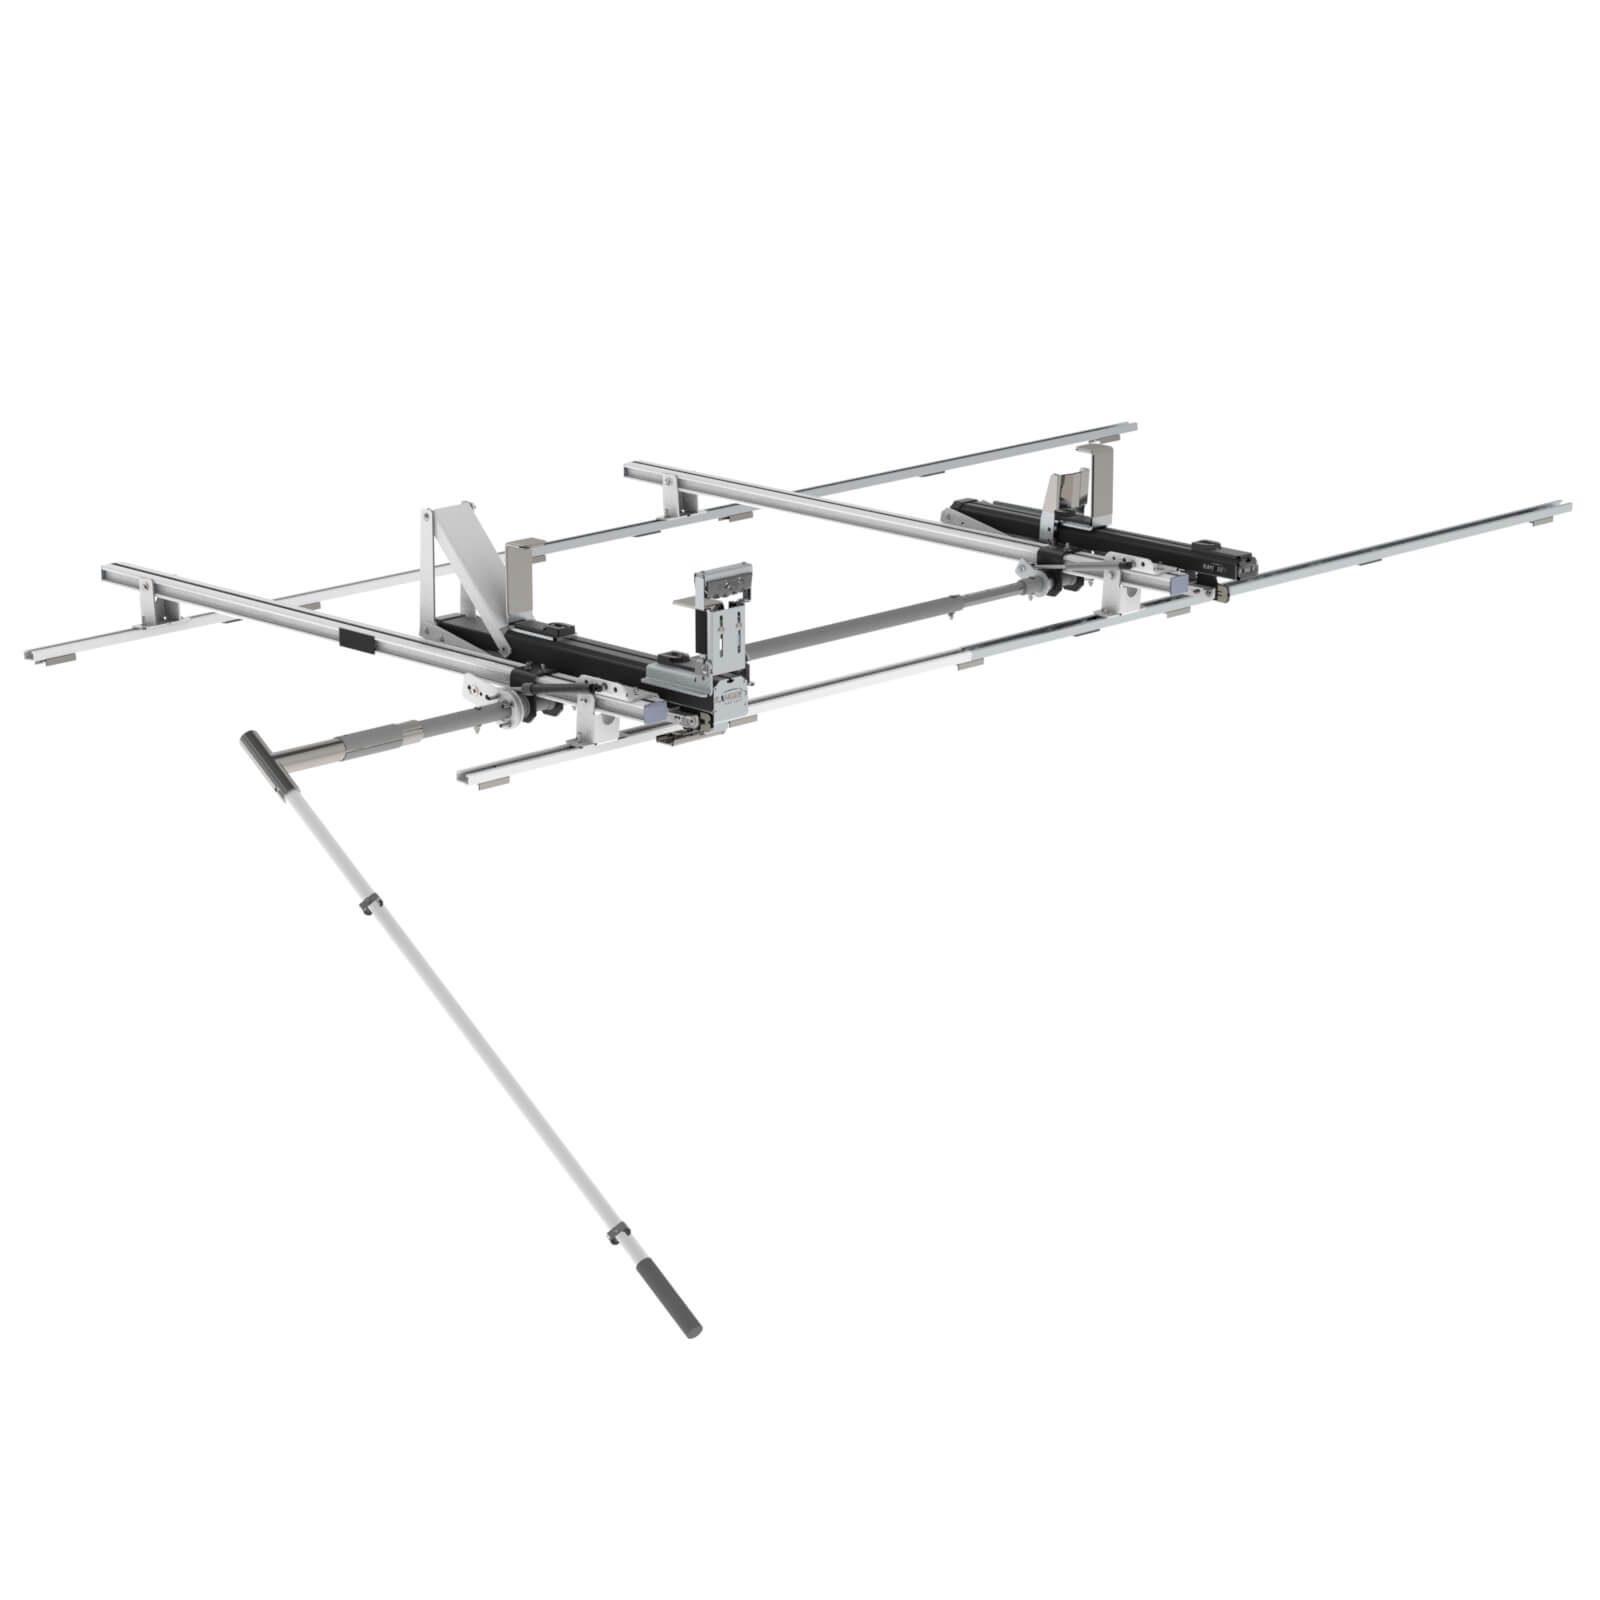 Max Rack 2 0 Drop Down Ladder Rack Single Side Ram